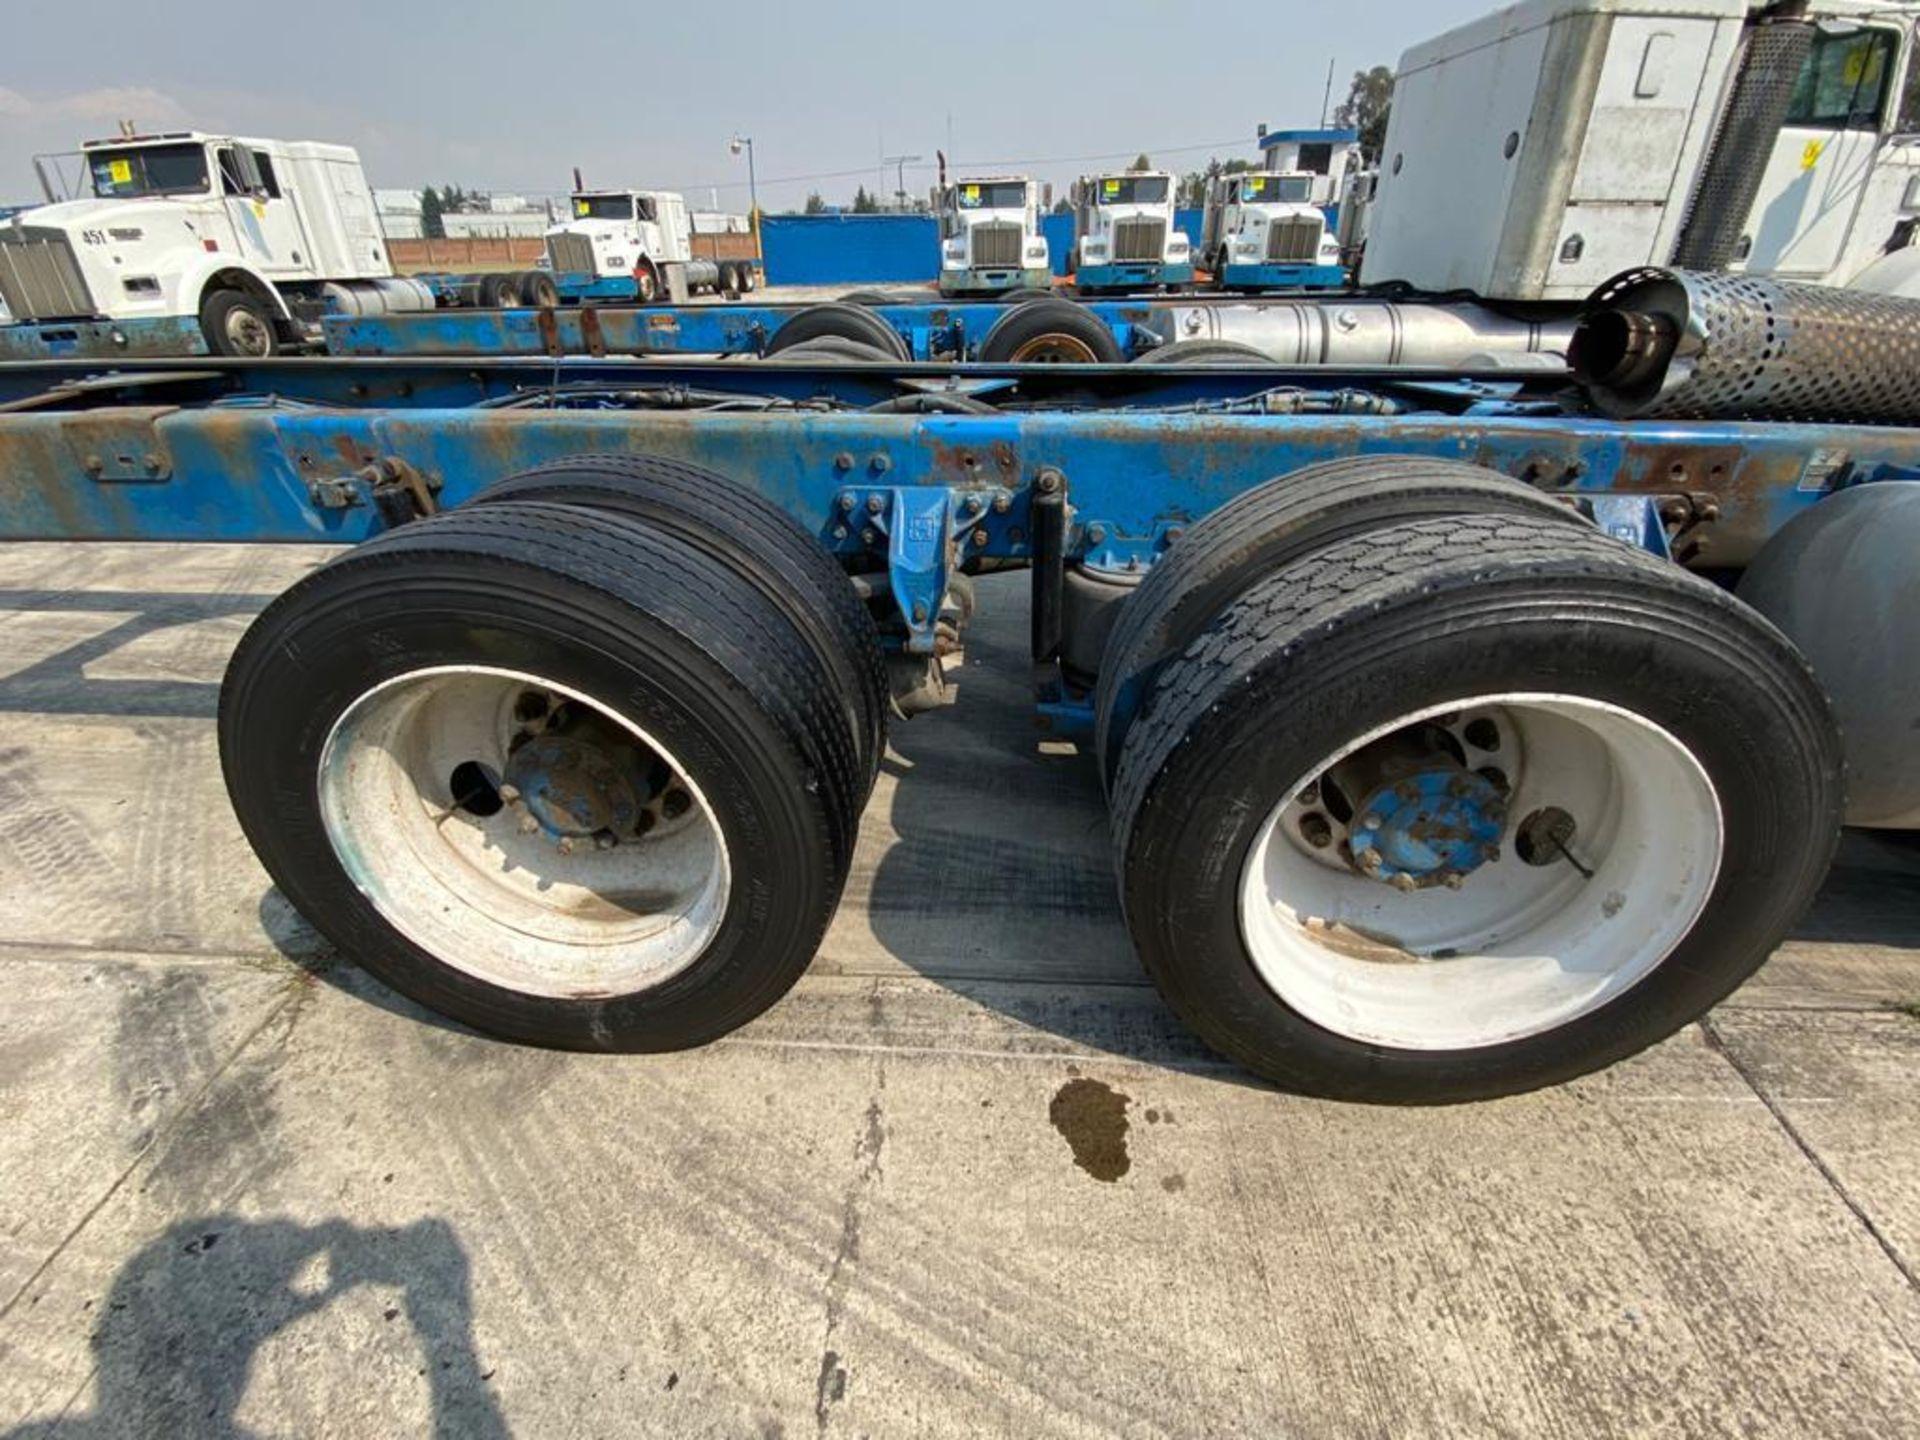 1999 Kenworth Sleeper truck tractor, standard transmission of 18 speeds - Image 23 of 72